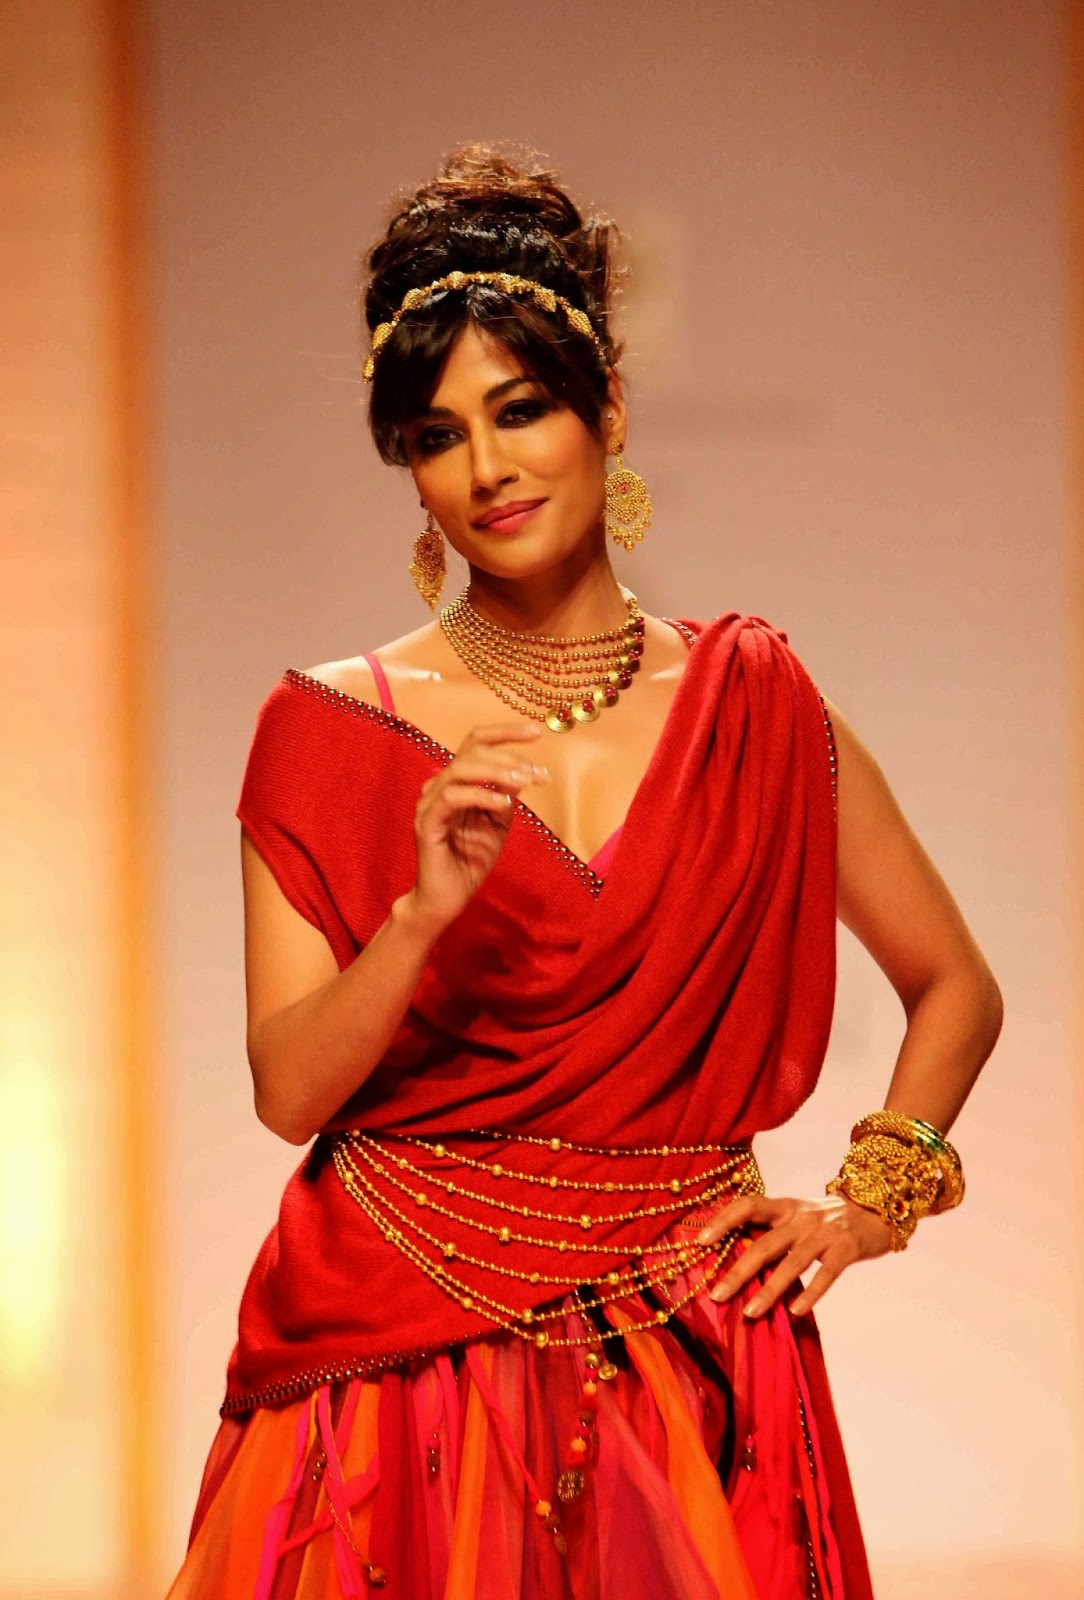 The Glitzy World !!: Azva launches new gold bridal jewellery collection - photo#18